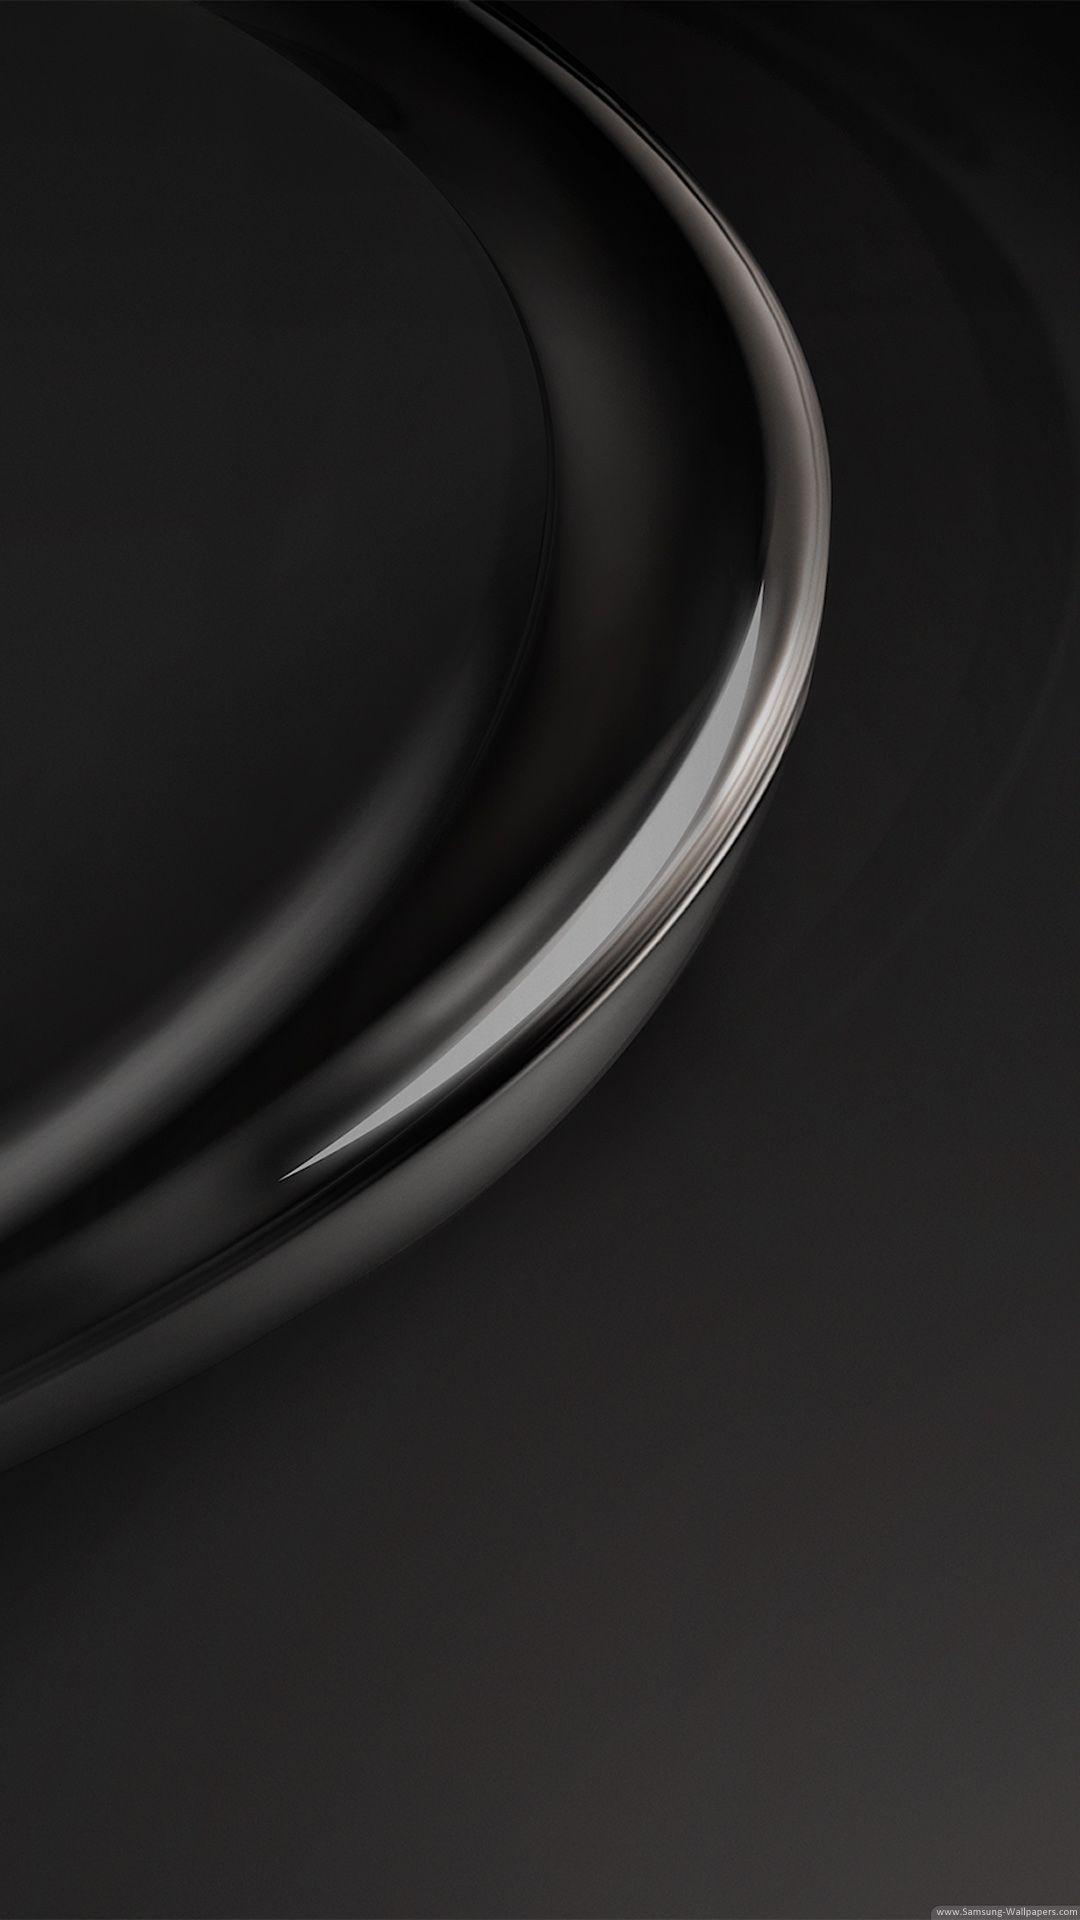 Samsung Galaxy C7 Official Black Stock 1080x1920 Wallpaper Samsung